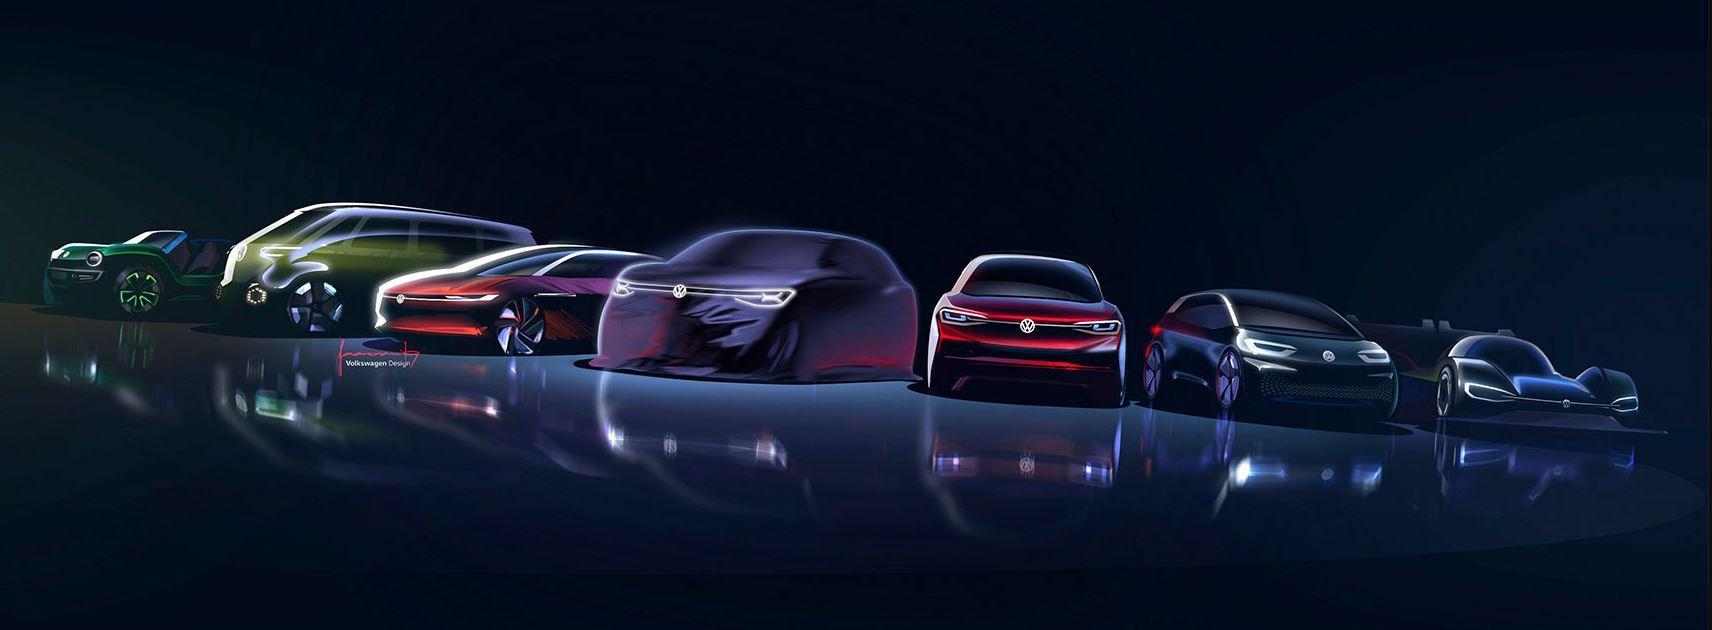 VW ID- Elektroauto Familie